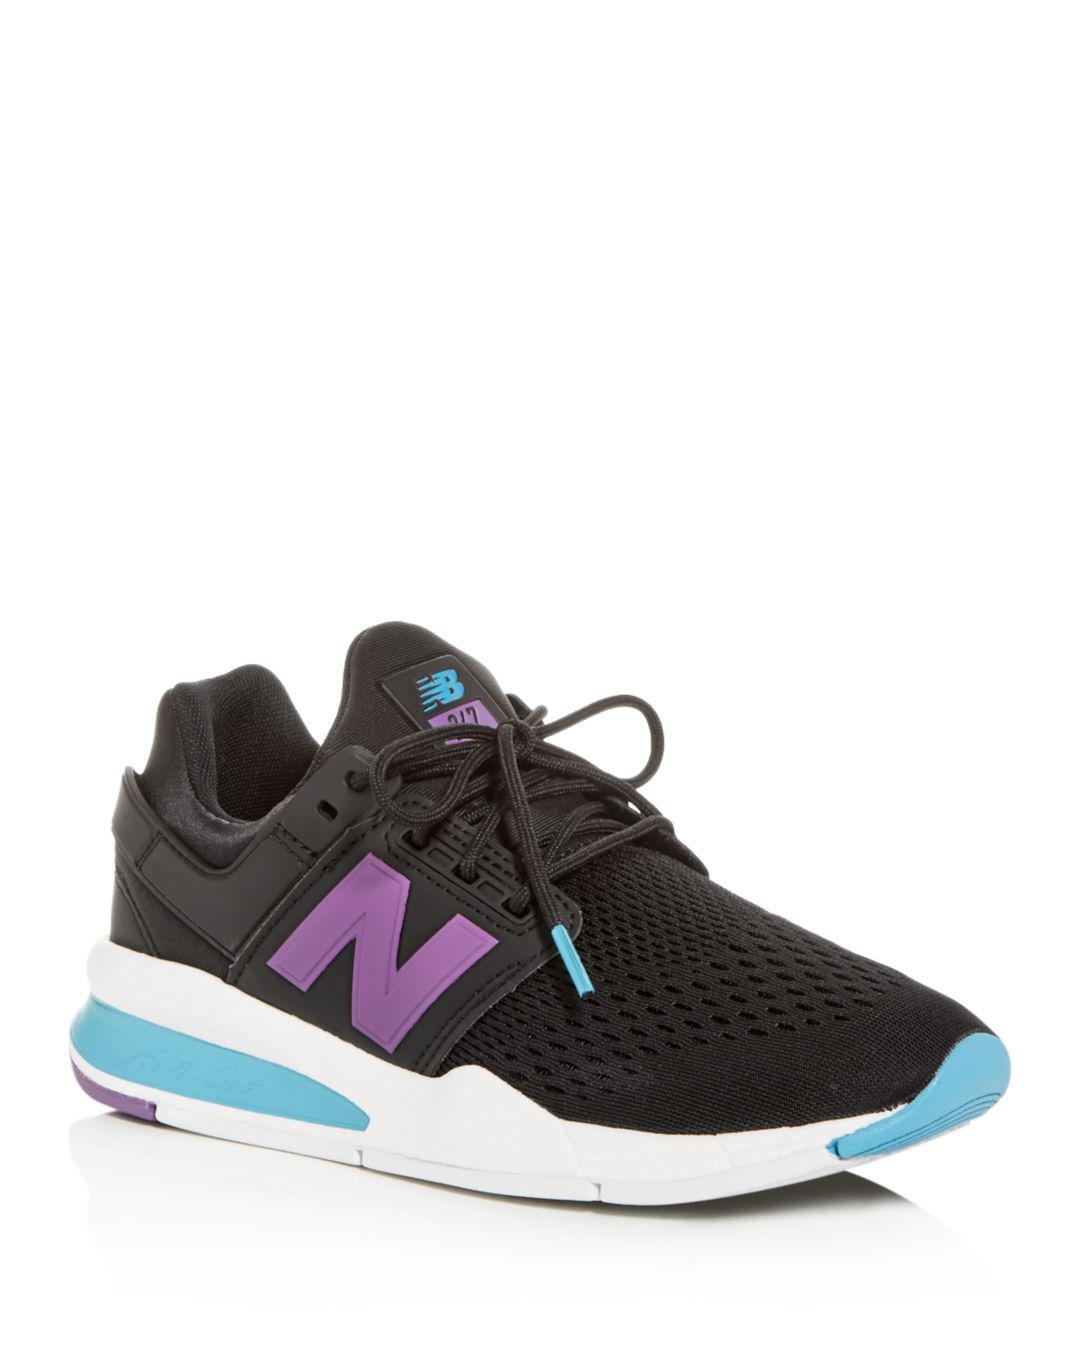 buy popular 22564 7a290 New Balance. Black Women s 247 Tritium Lace Up Trainers